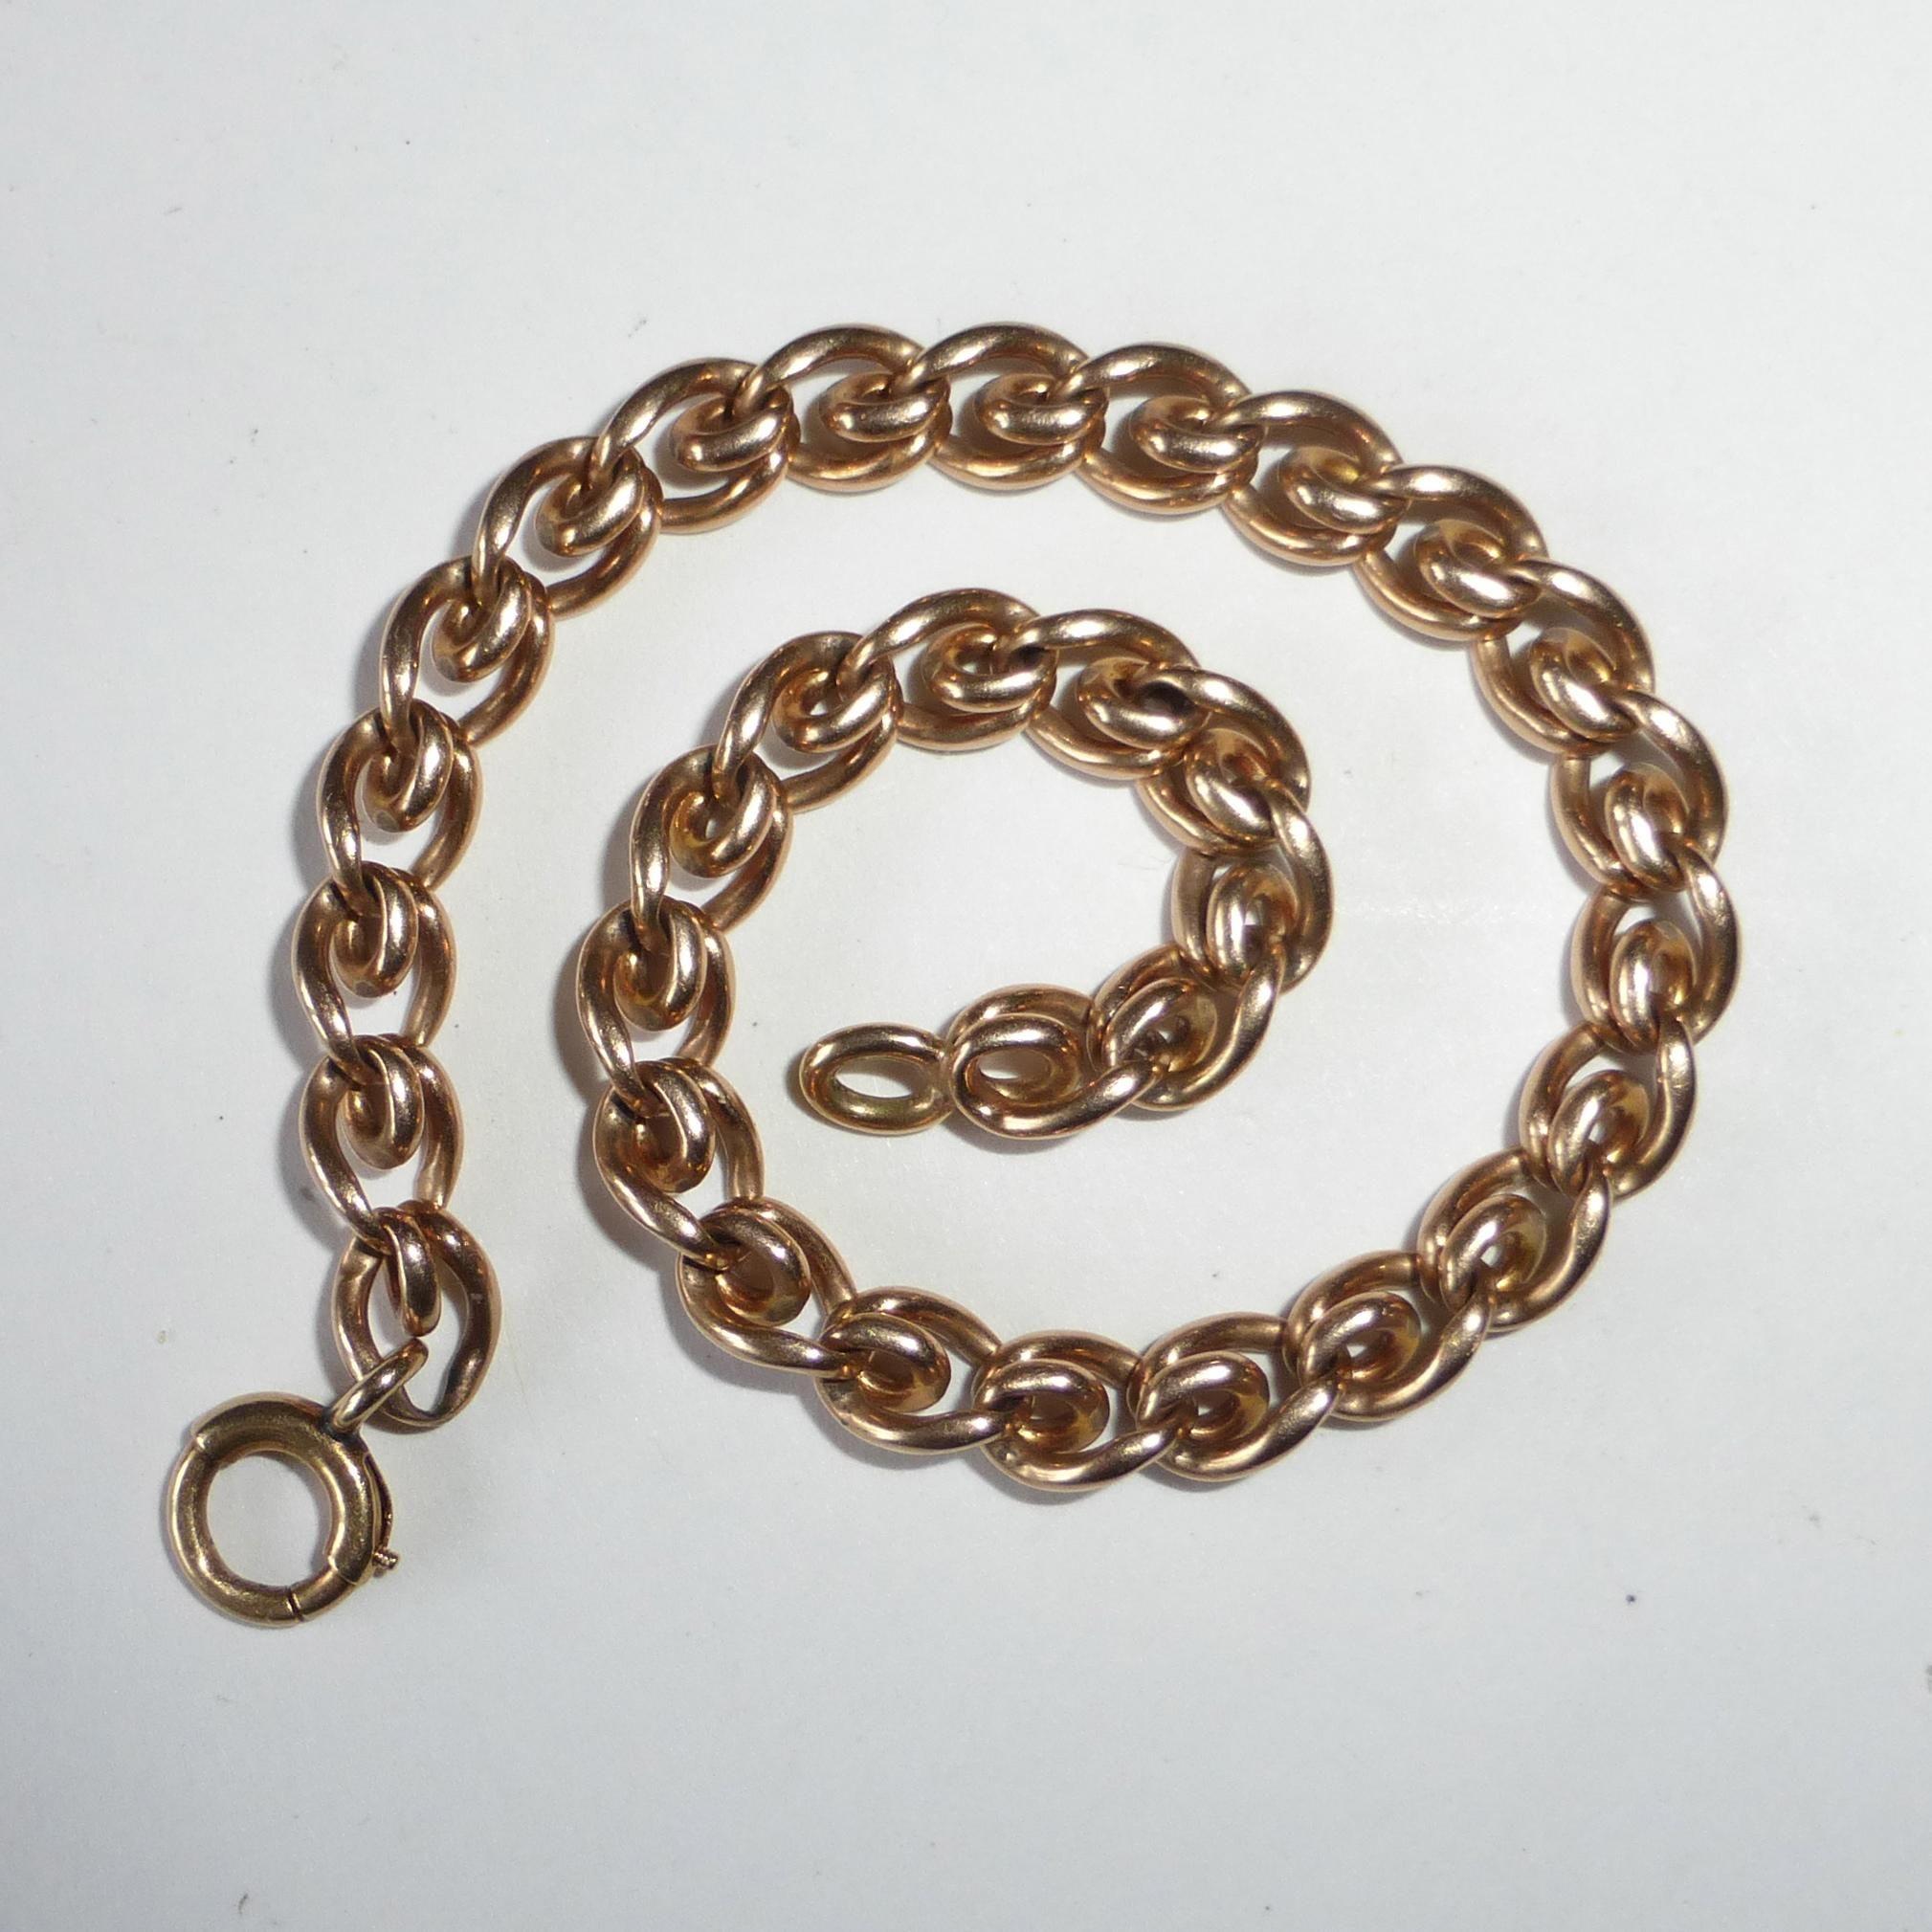 14k Rose Gold Heavy Curled Link Chain Bracelet